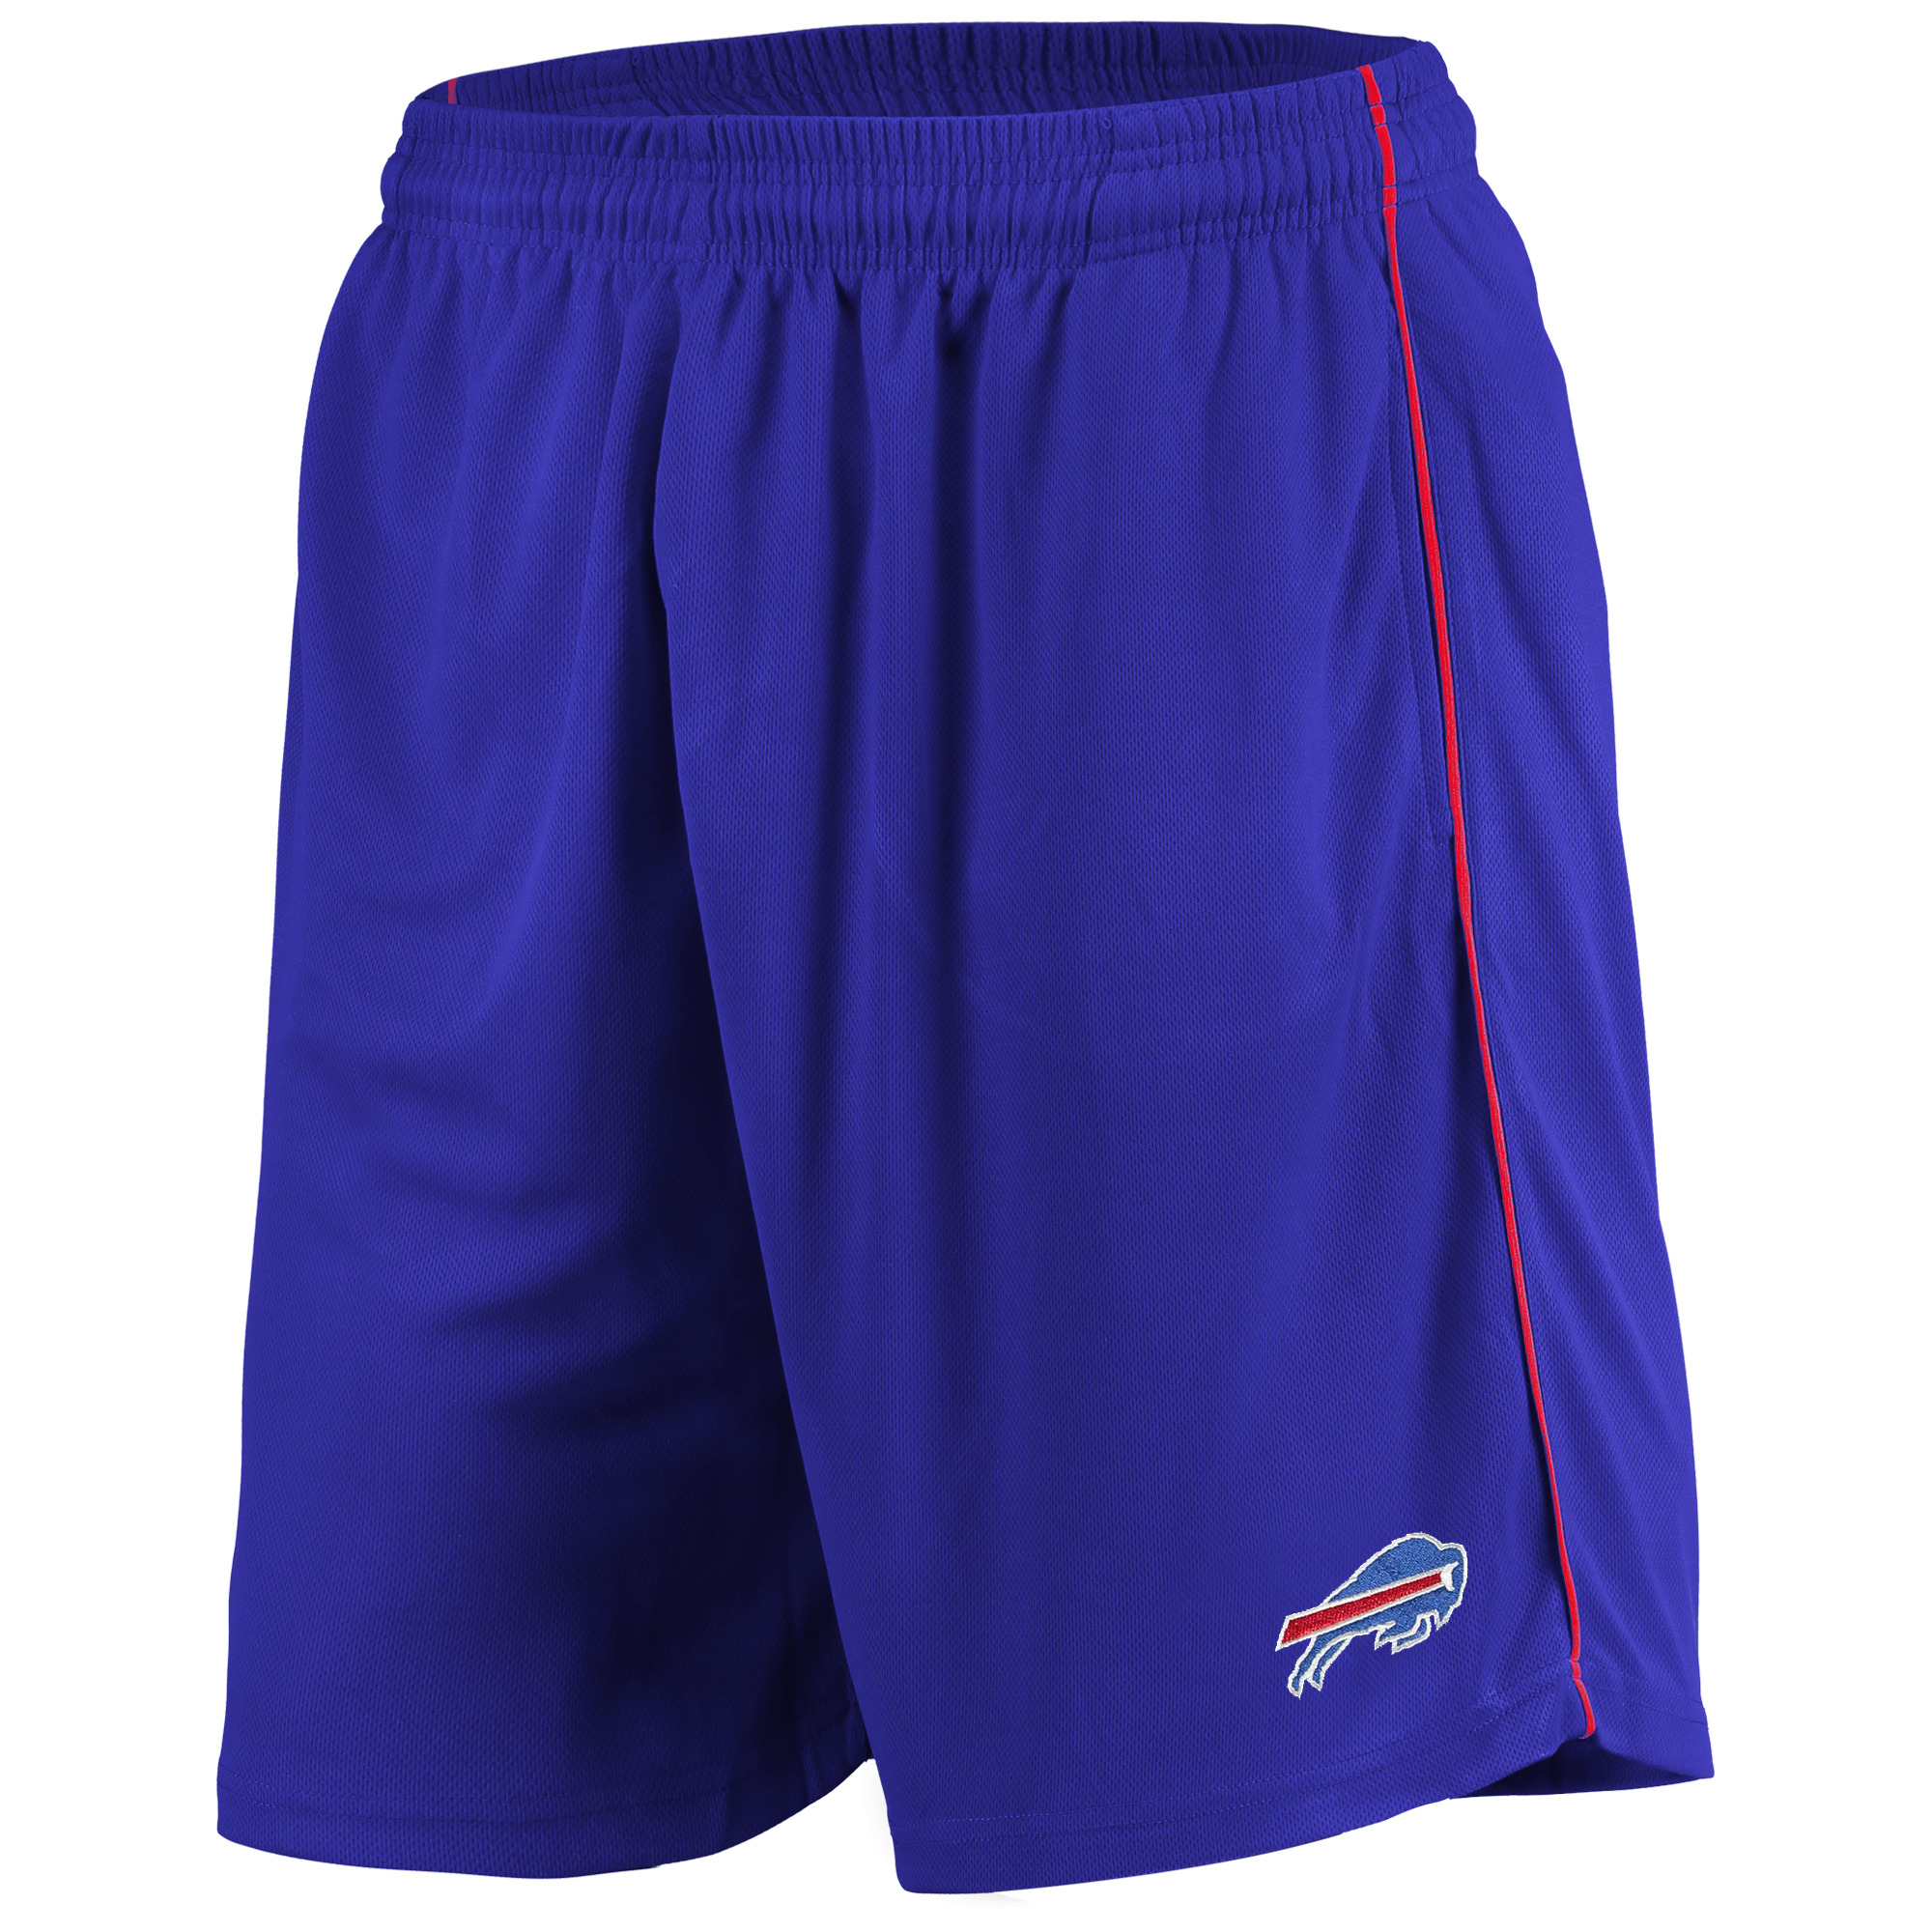 Men's Majestic Royal Buffalo Bills Mesh Shorts